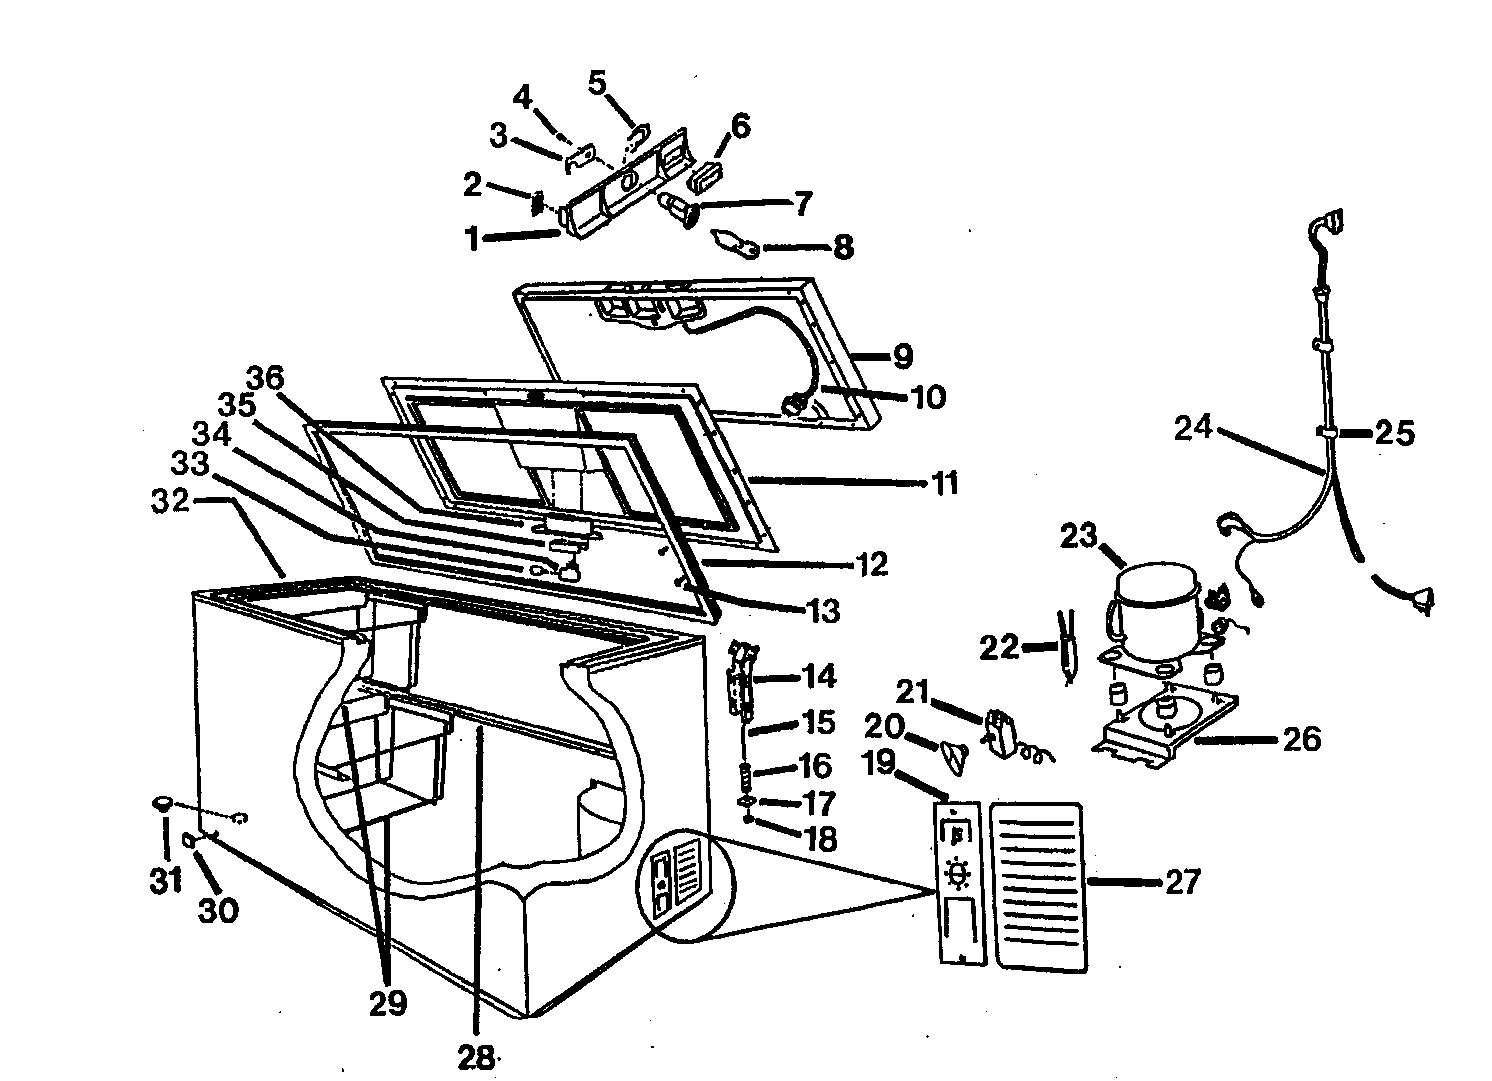 Wc-Wood model C1011W3 chest freezer genuine parts